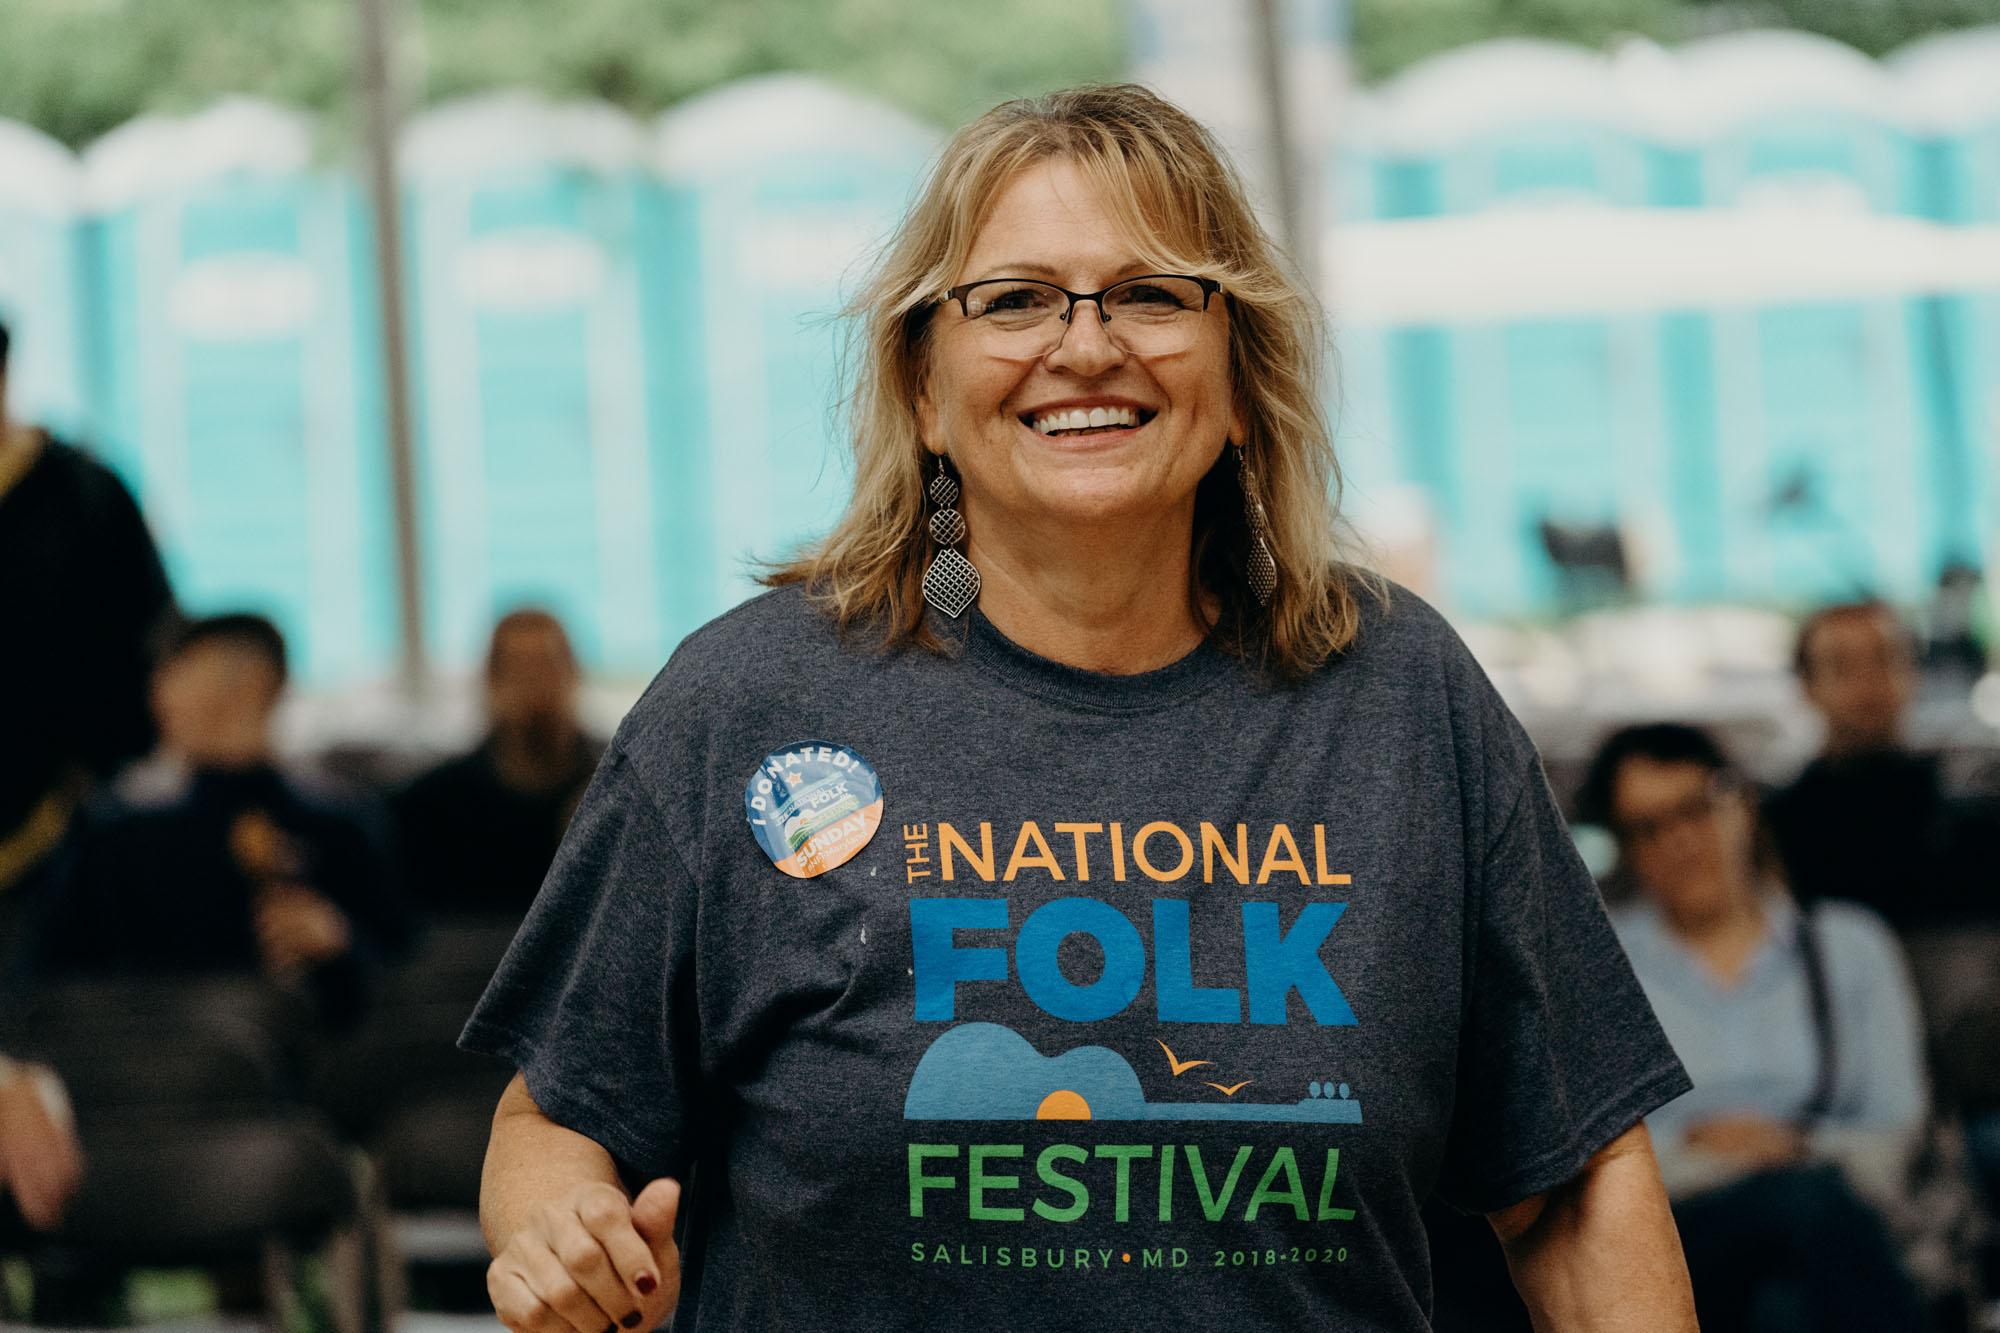 National Folk Festival 2018 Smiling Volunteer - Chris Mcintosh